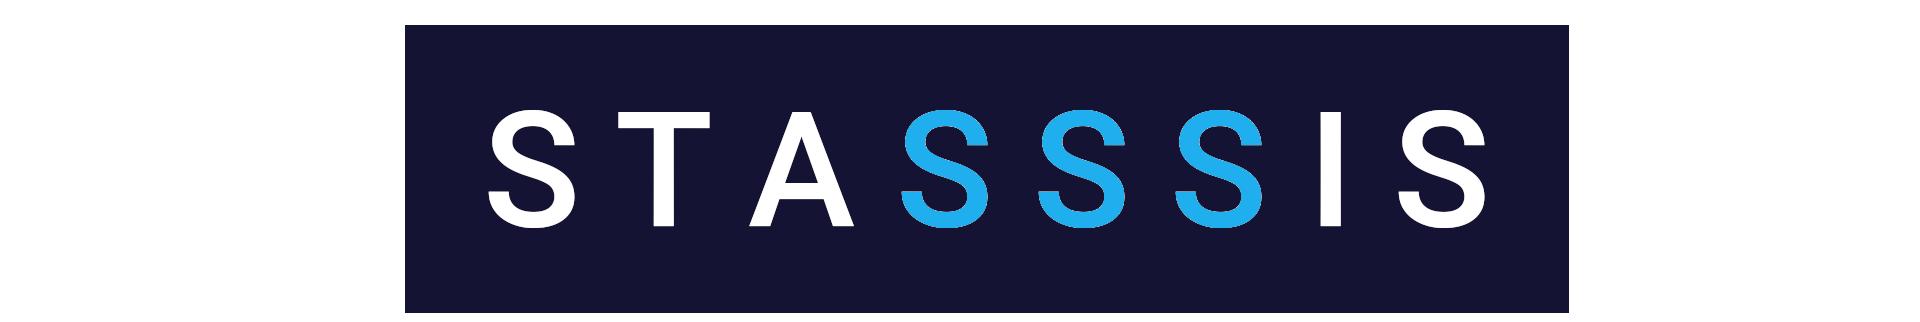 Stasssis